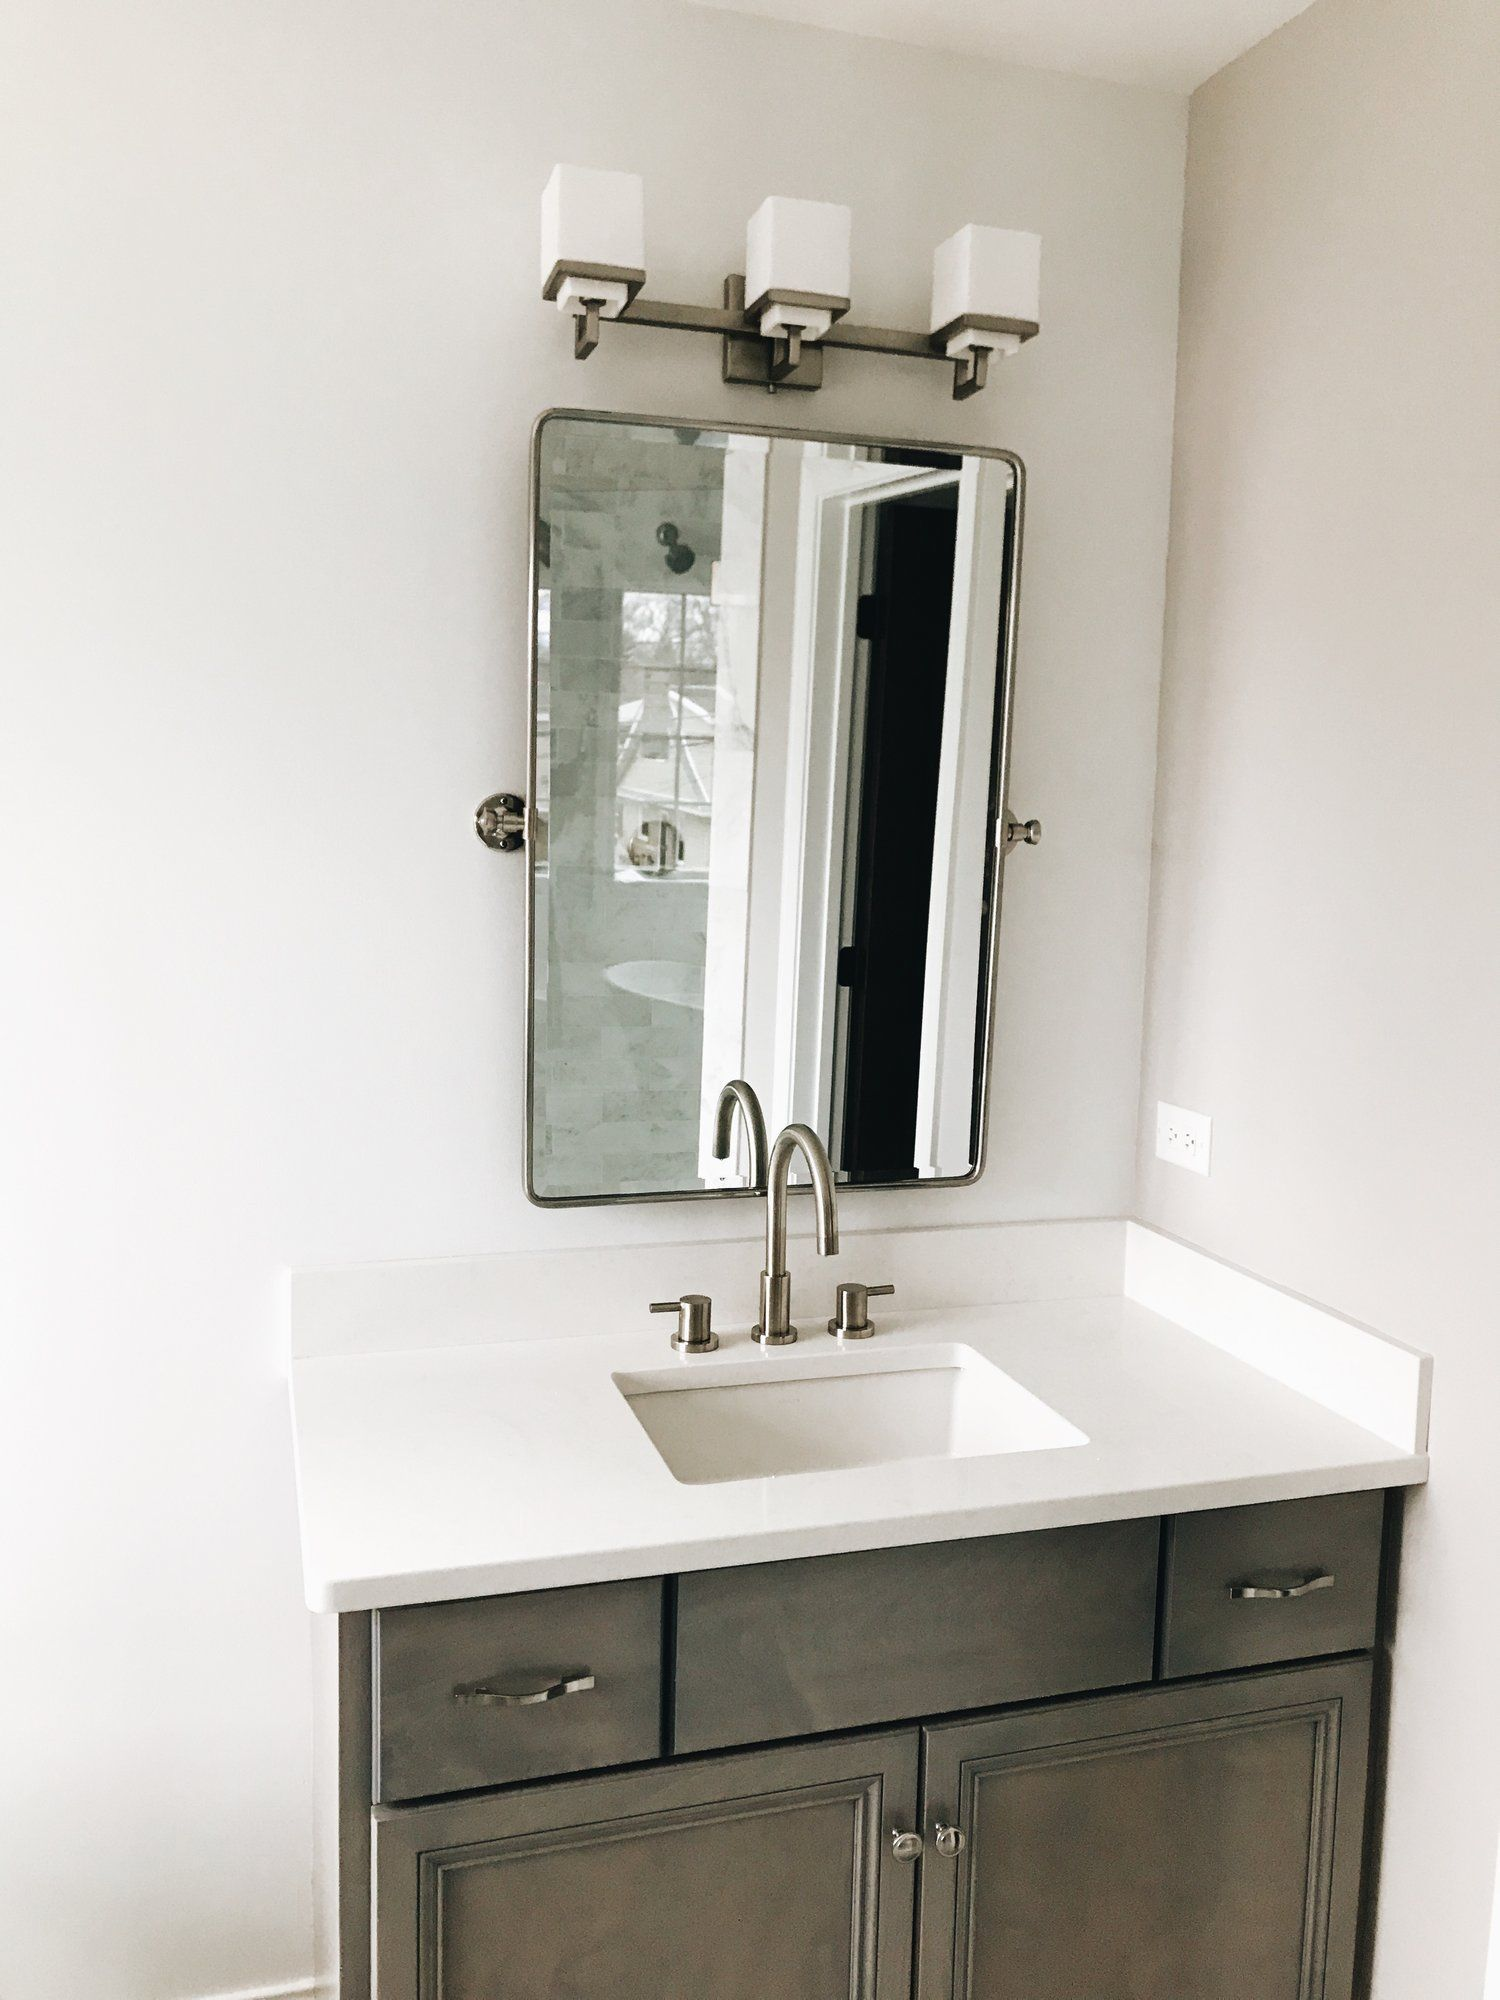 10 Budget Friendly Diy Vanity Mirror Ideas Vanity Mirror With Led Lights Bathroom Small Simple Bathroom Vanity Mirror Bathroom Vanity Bathroom Vanity Redo